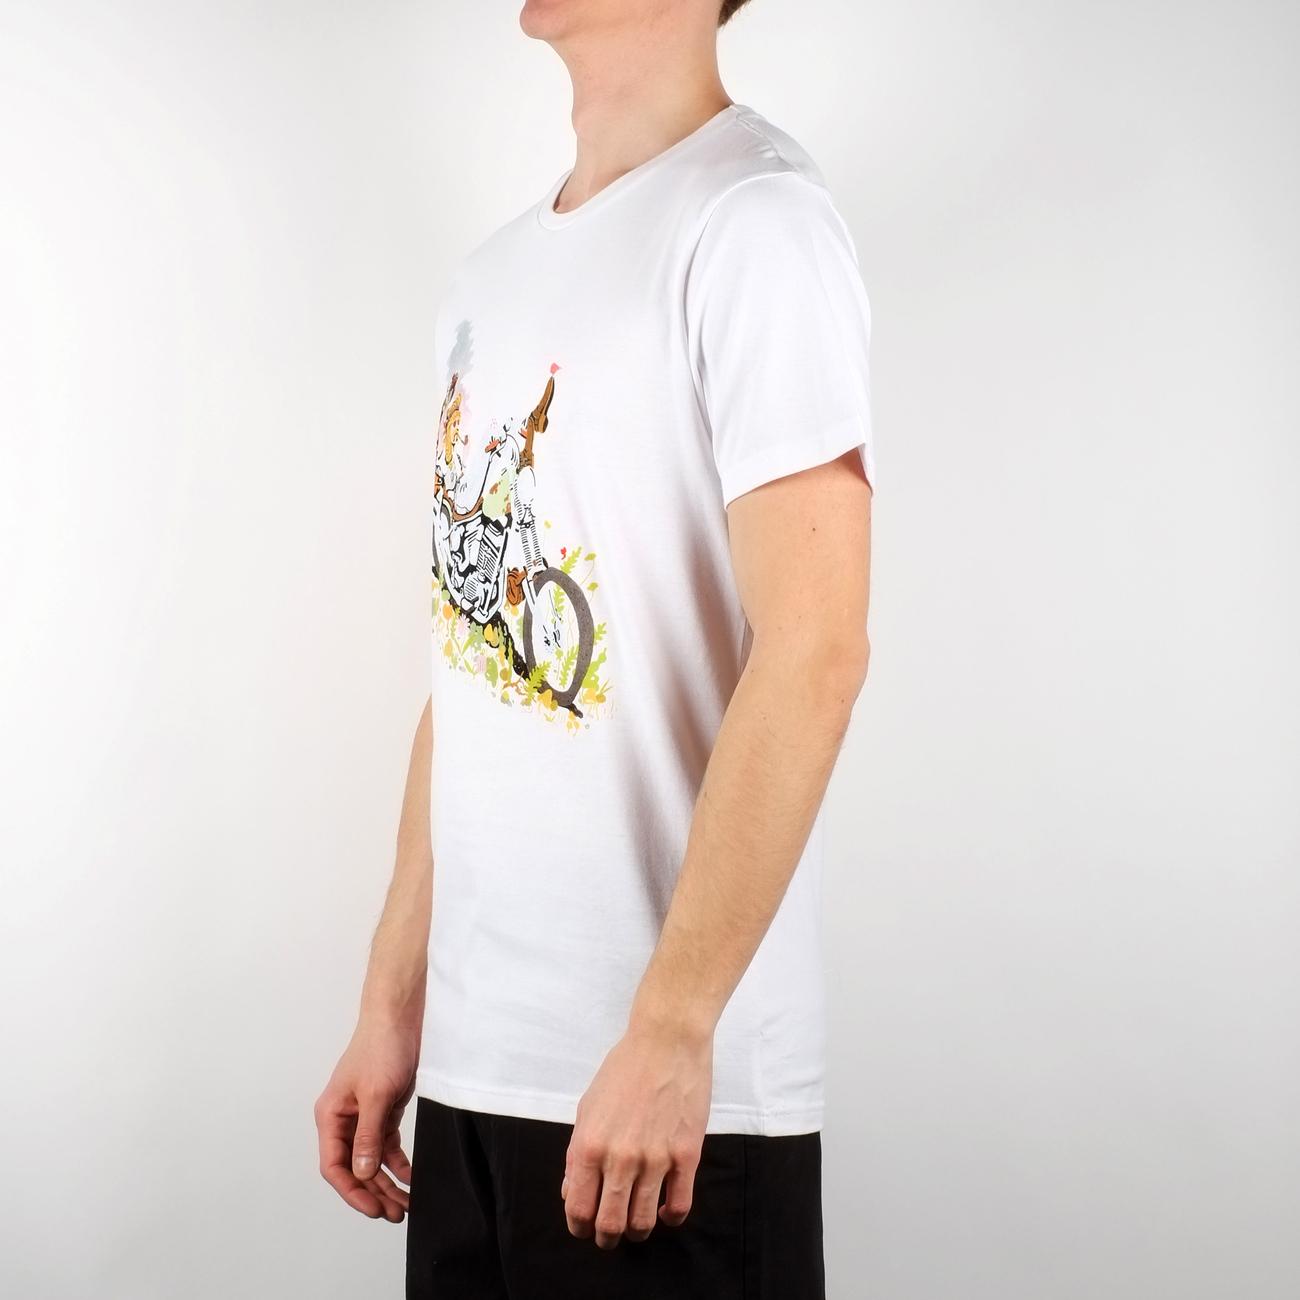 Stockholm T-shirt Ride Easy